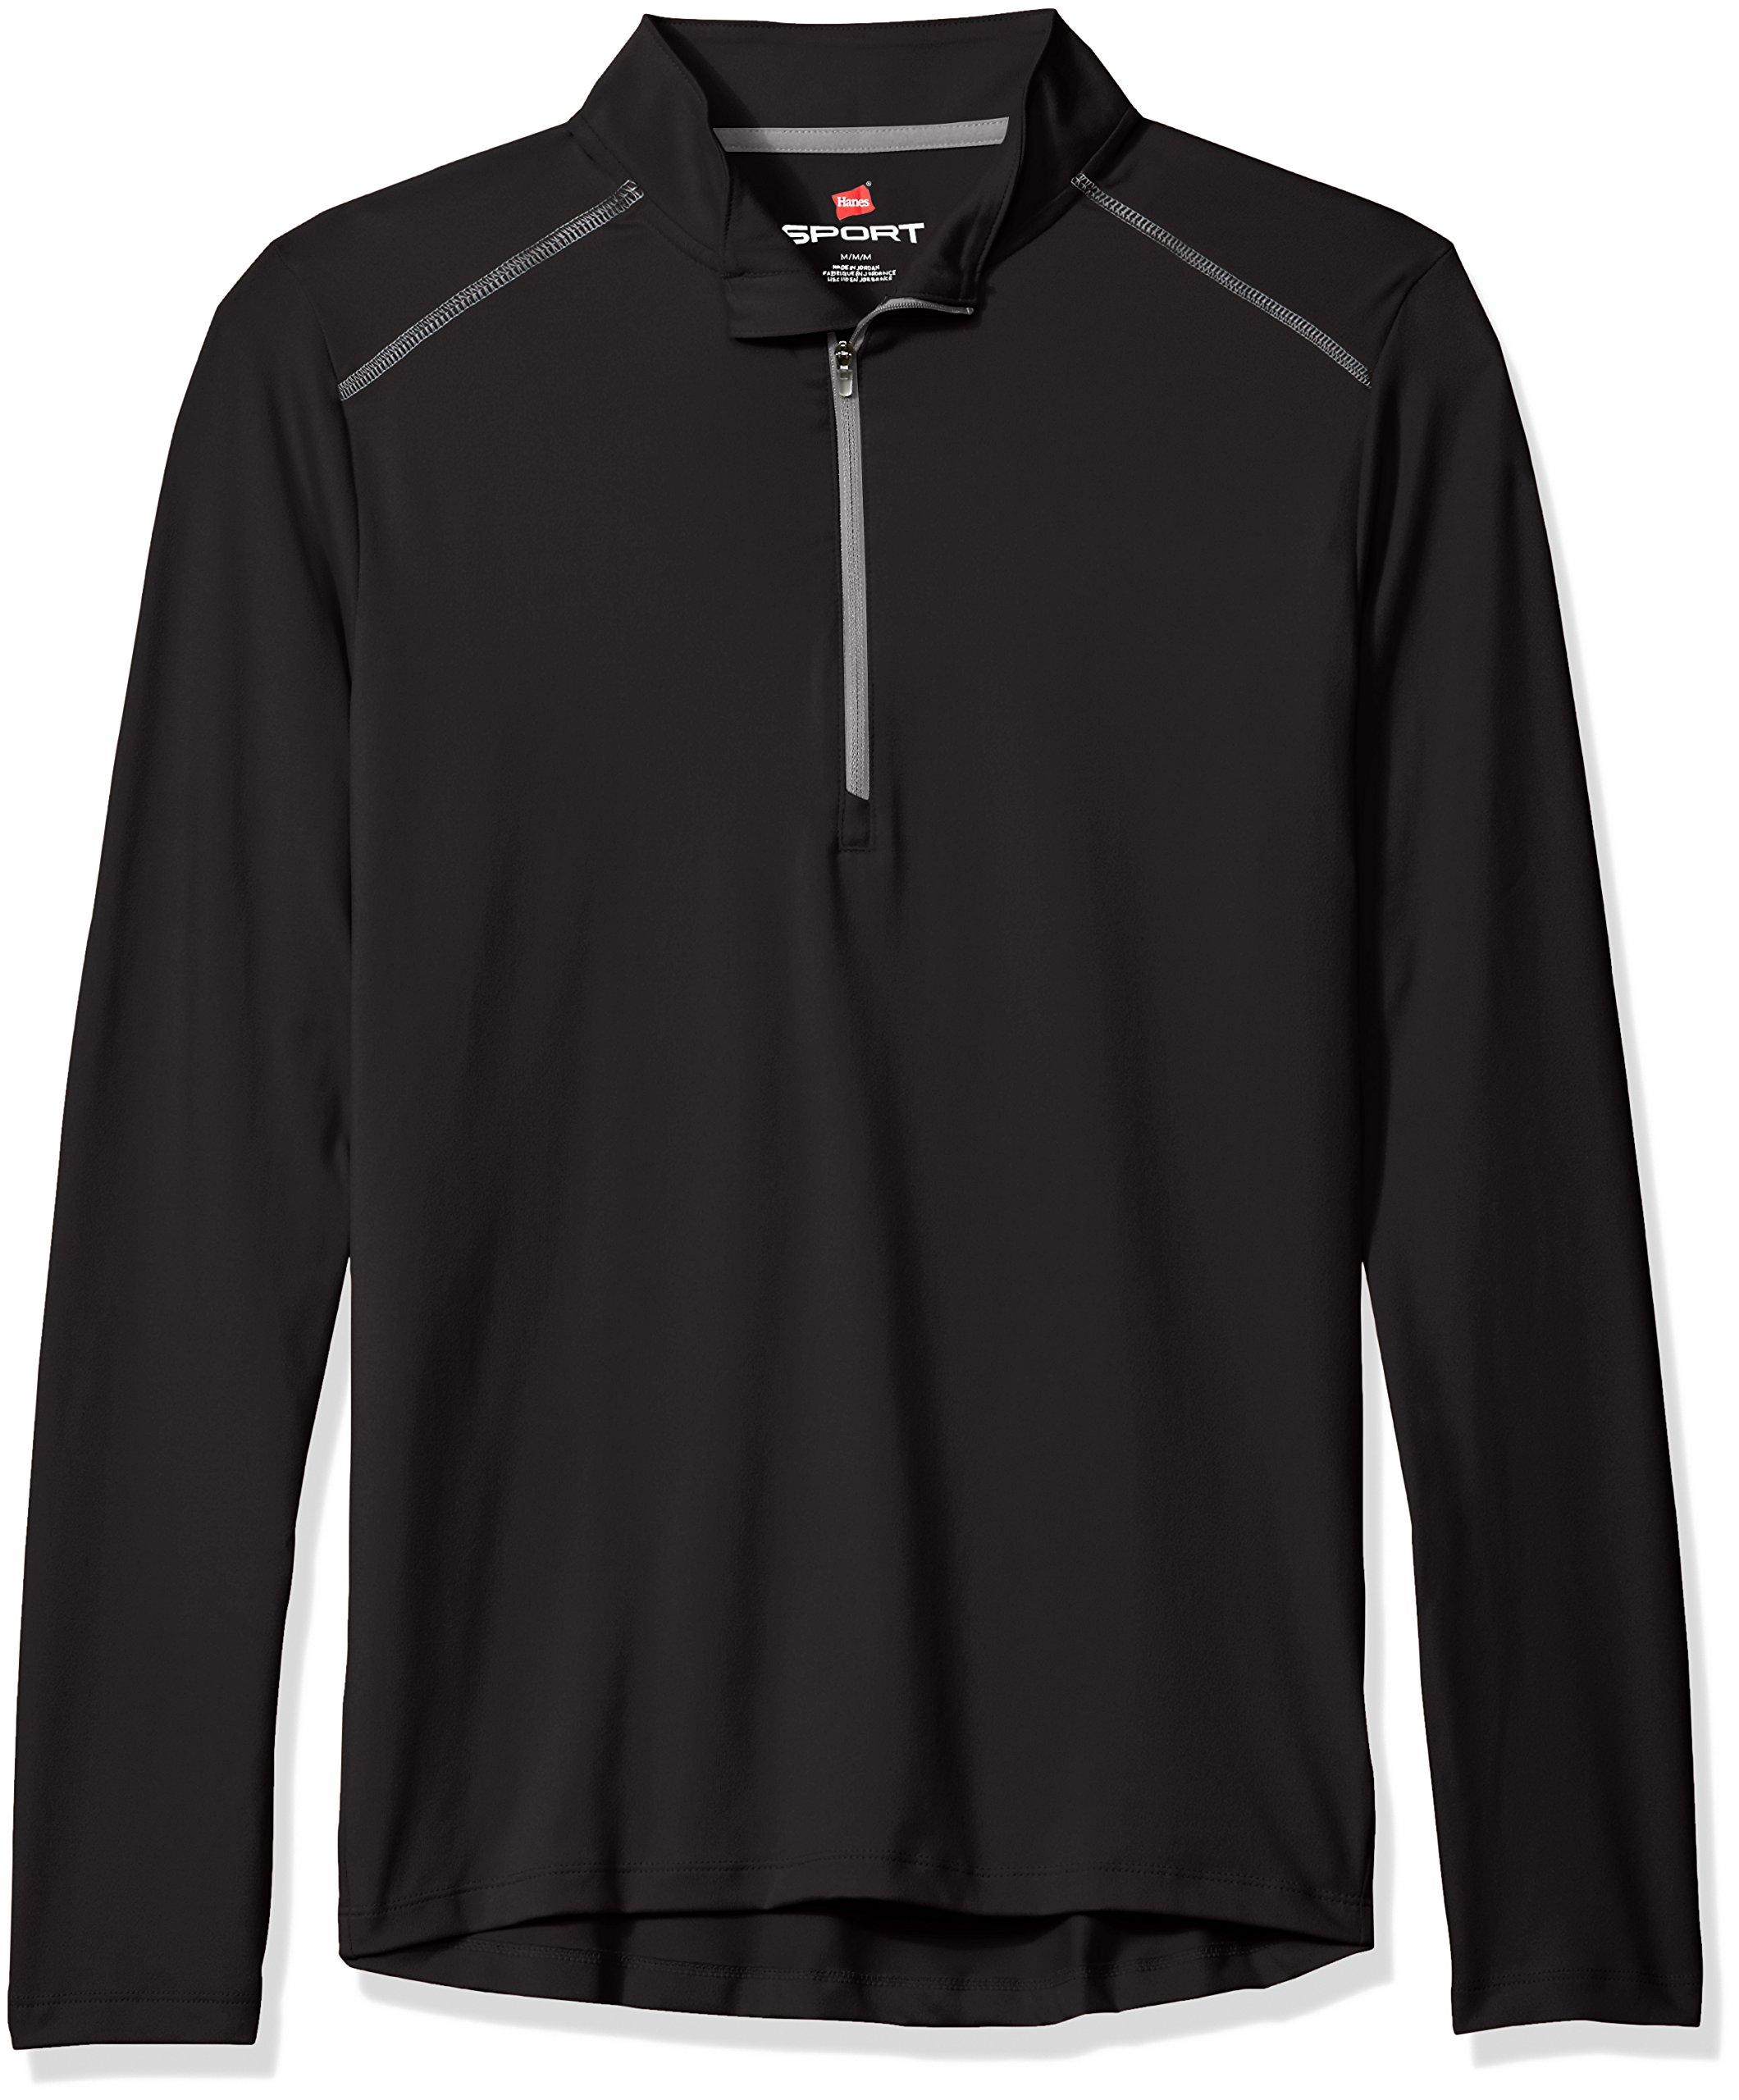 Hanes Men's Sport Performance Quarter-Zip Pullover, Black, XL